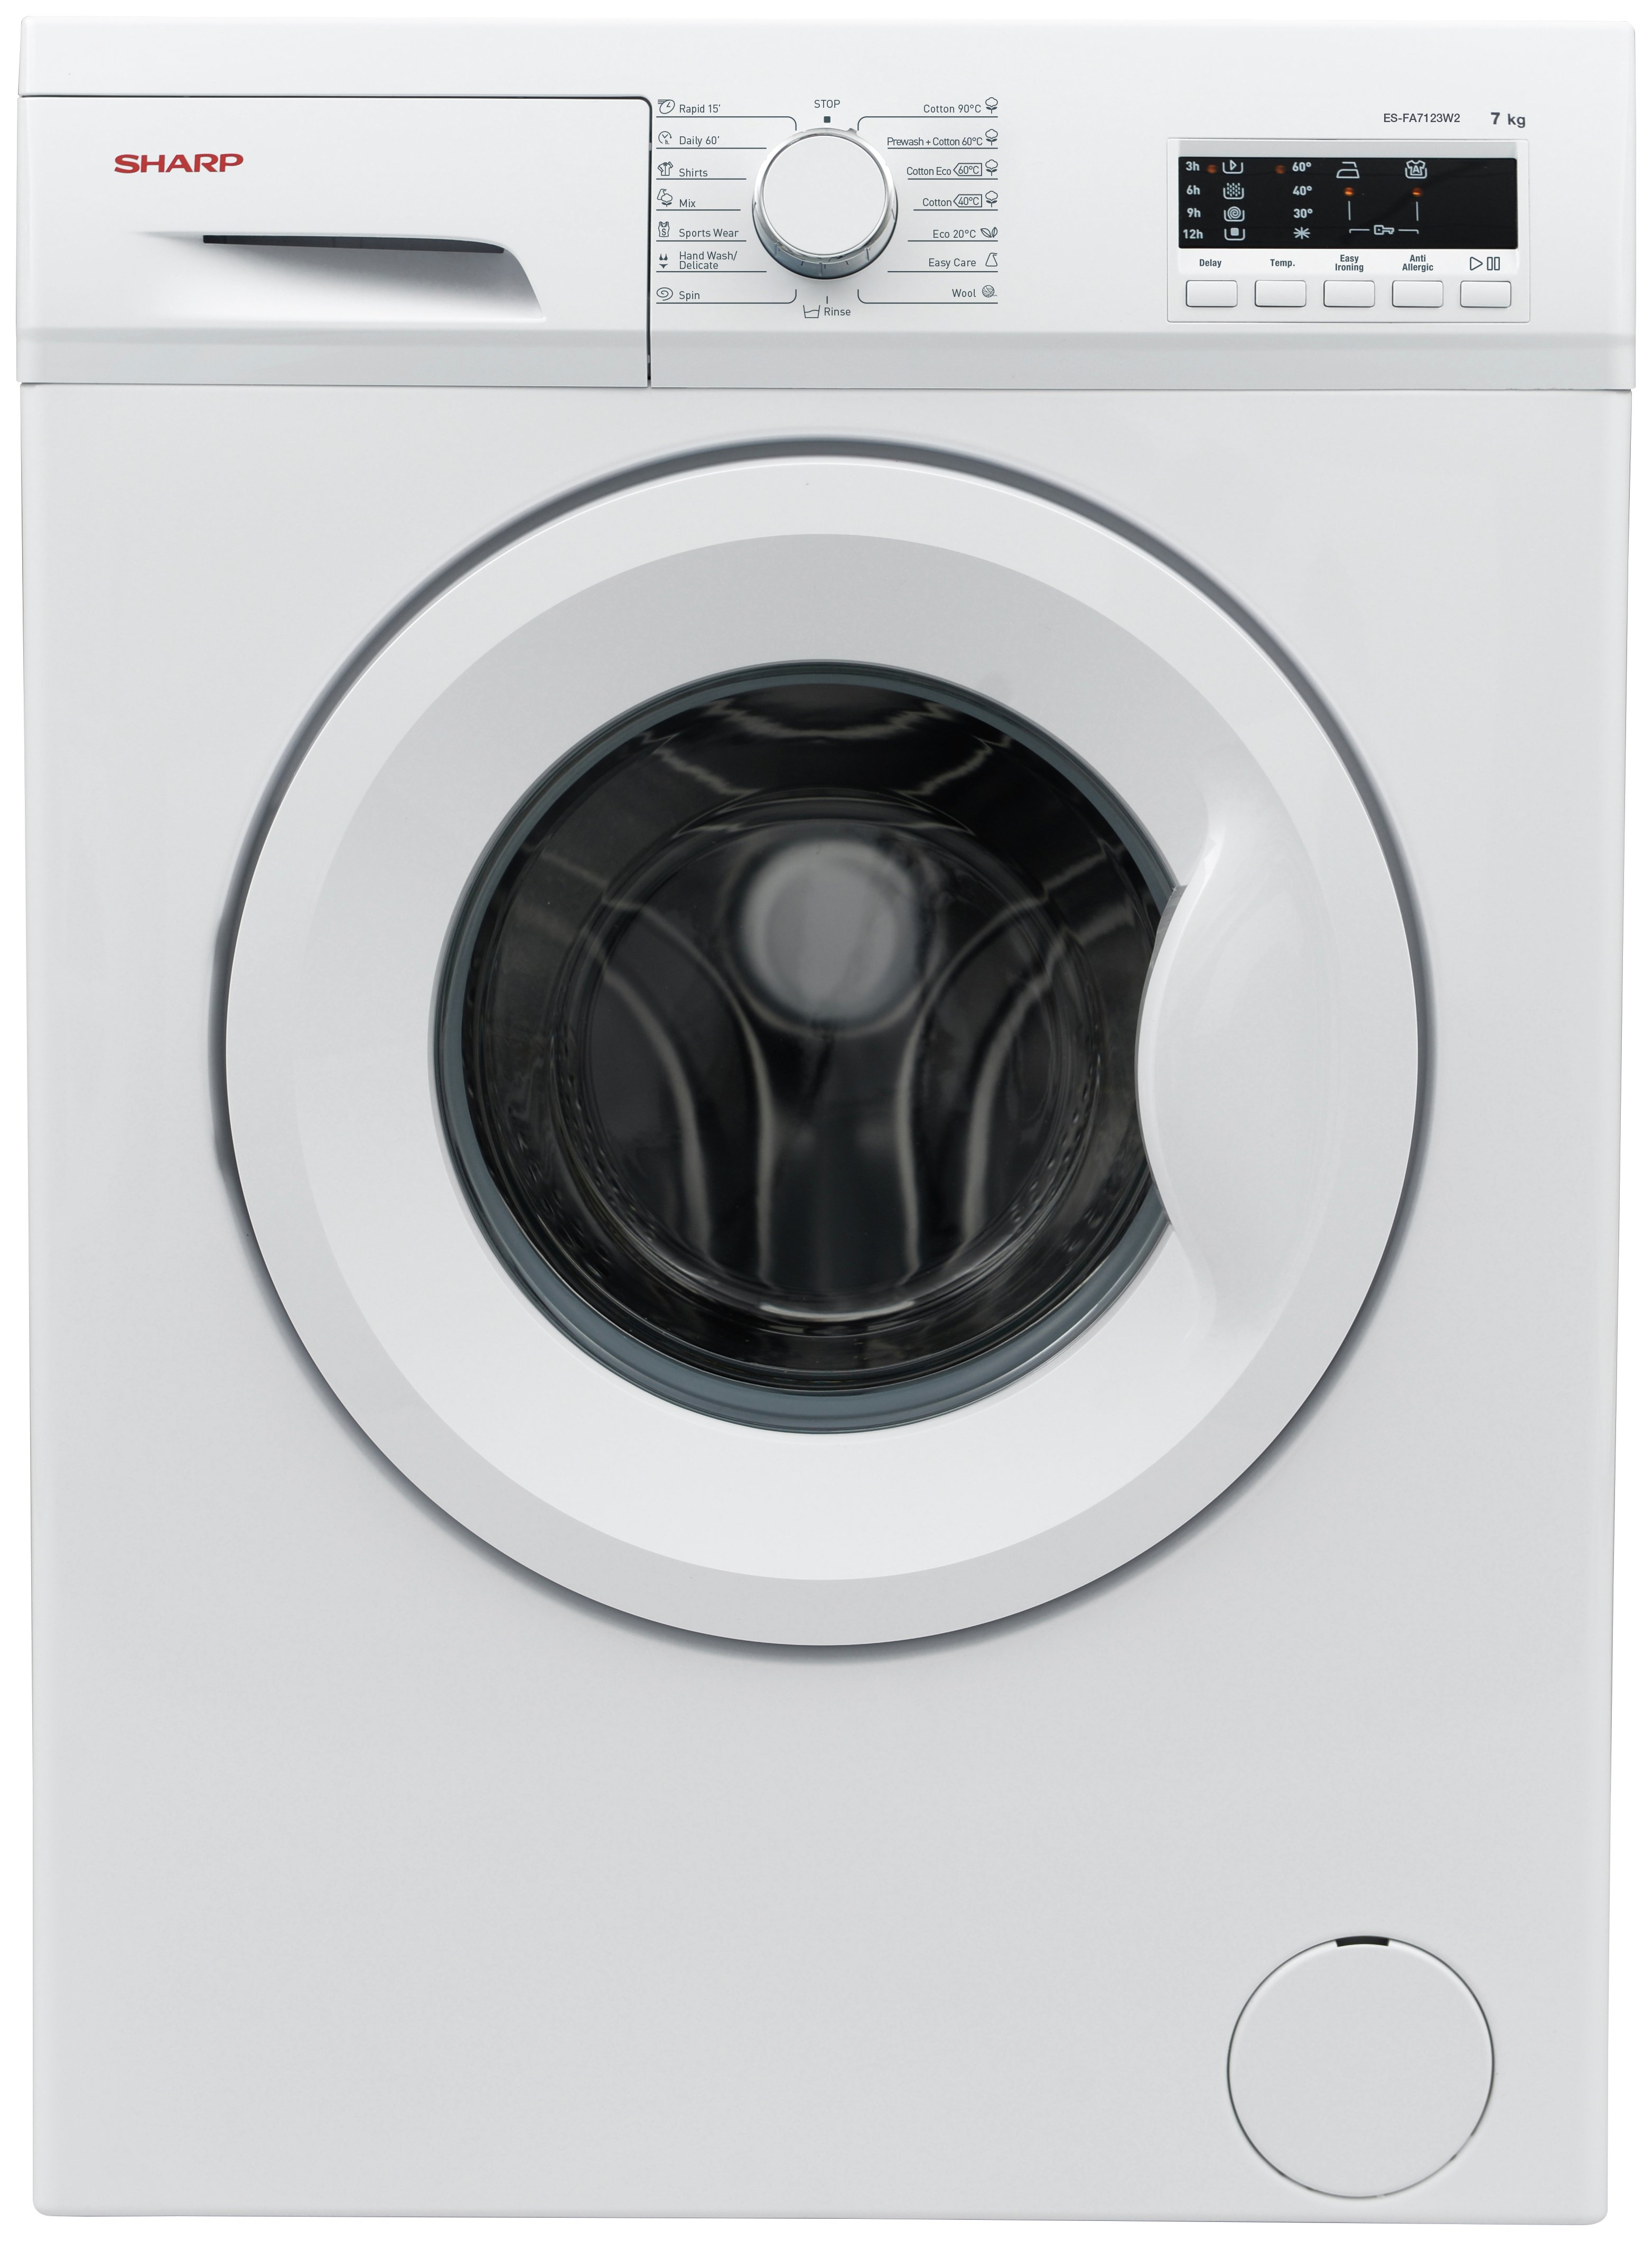 Sharp - FA7123W2 7KG - Washing Machine